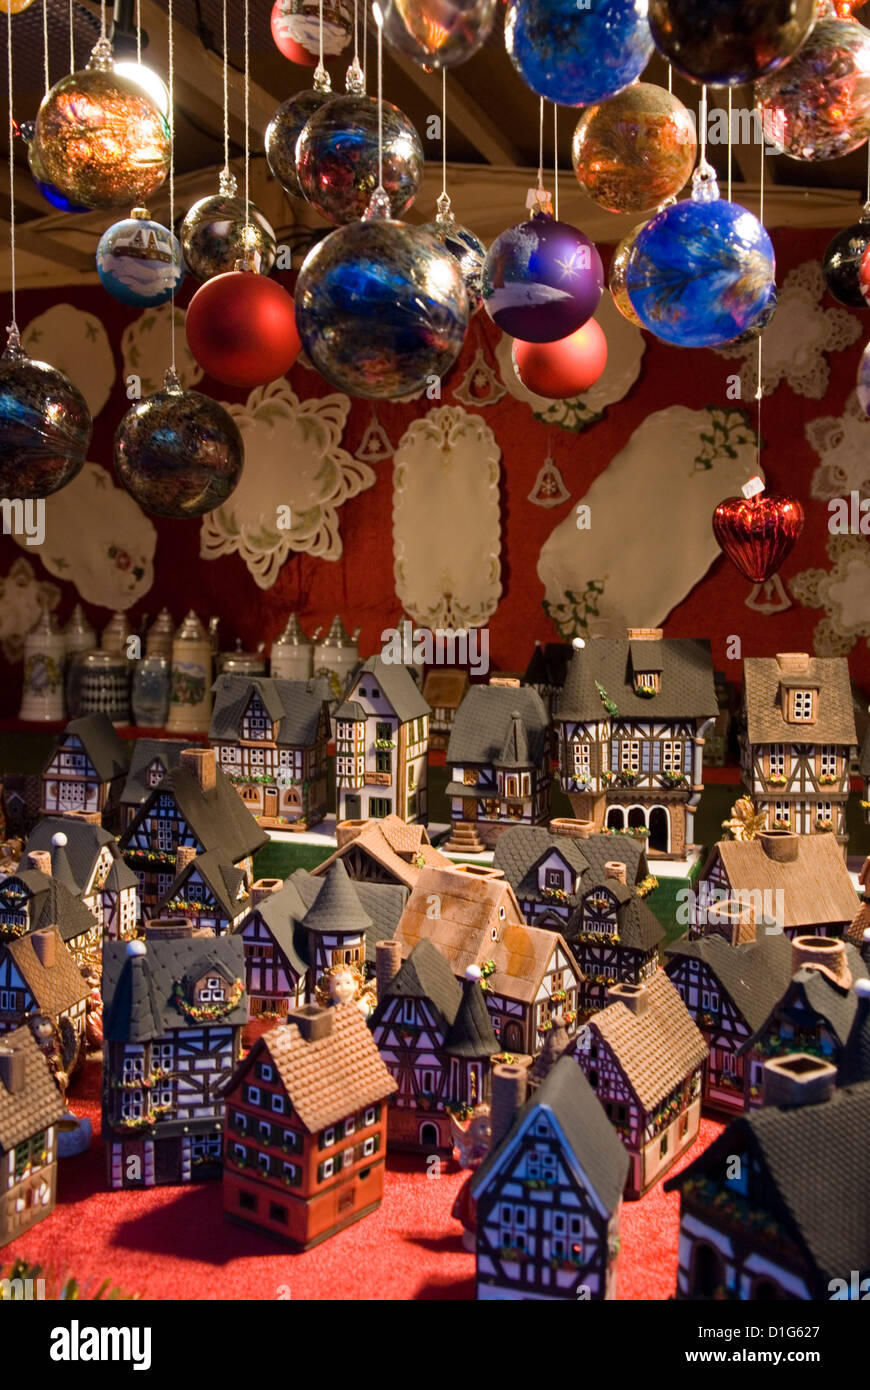 Blocage de décoration de Noël, Berlin, Germany, Europe Photo Stock